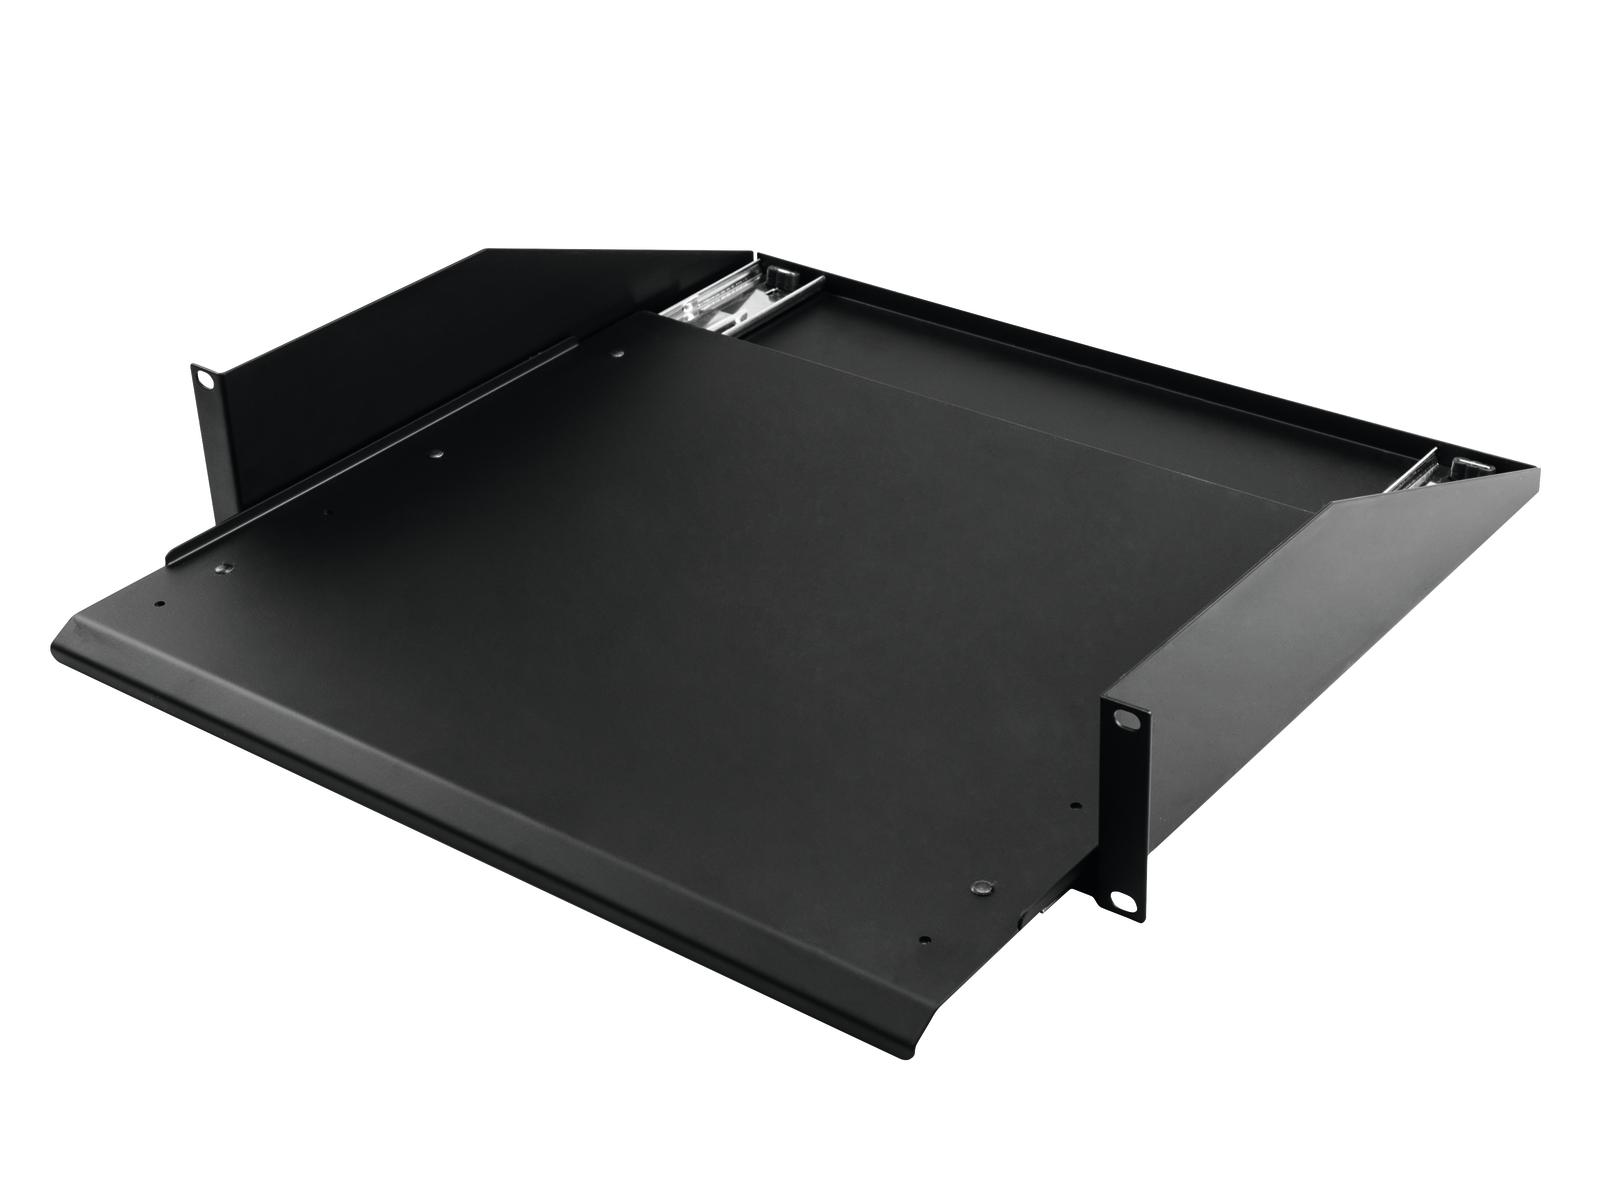 steinigke-rackboden-2he-ausziehbar